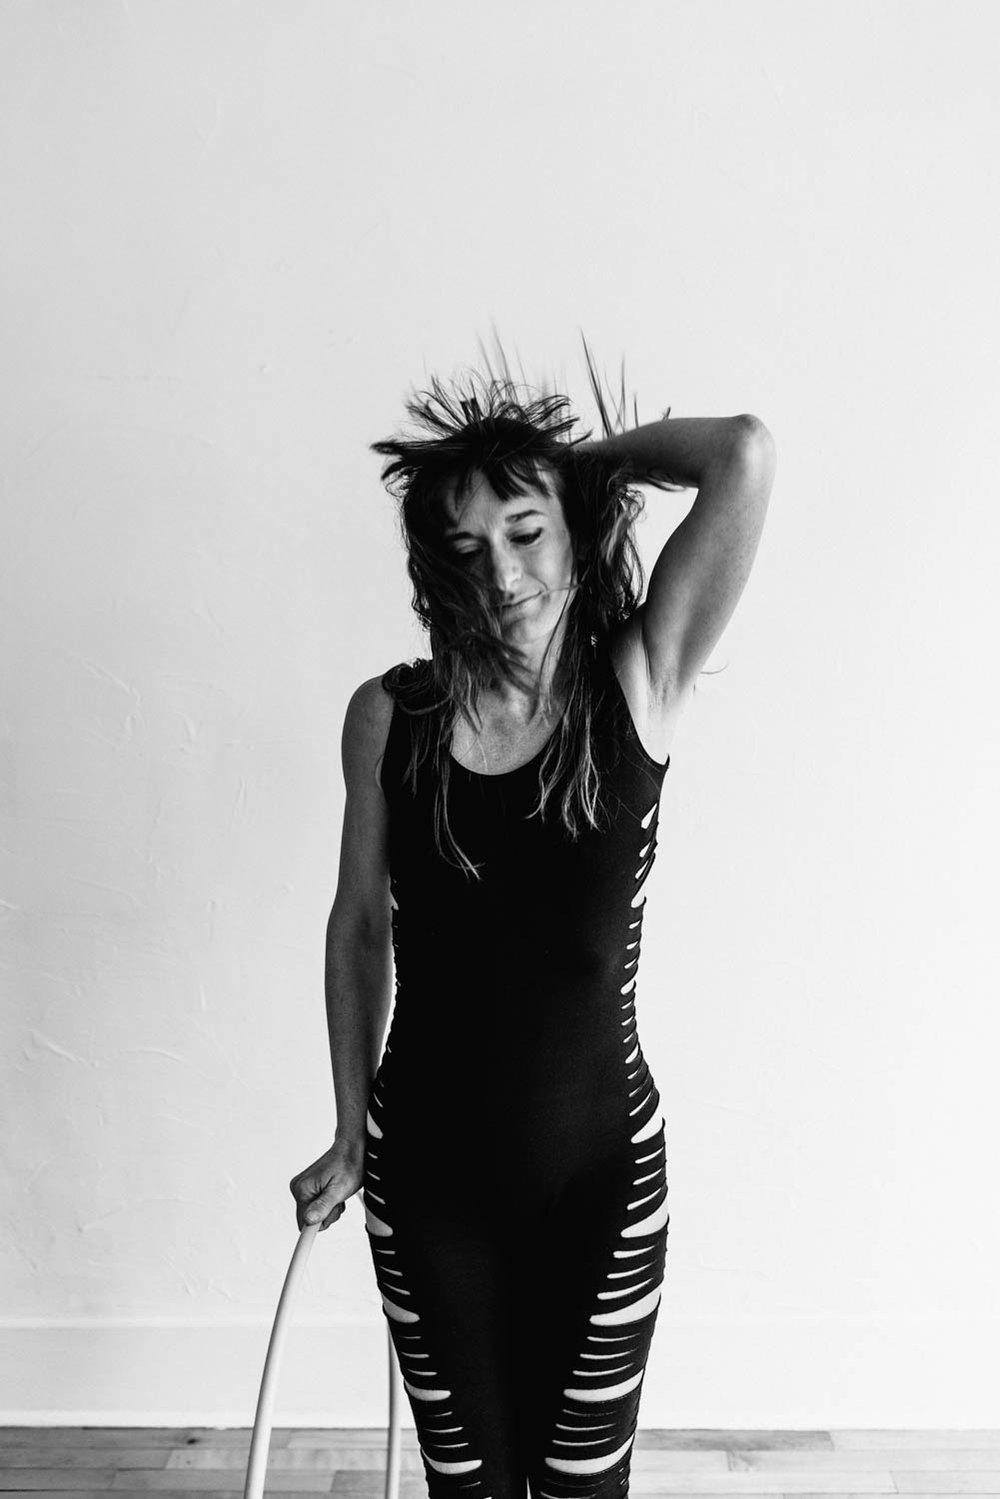 woman-with-hula-hoop-black-white-hair-flip-©Copyright-Elisabeth-Waller.jpg